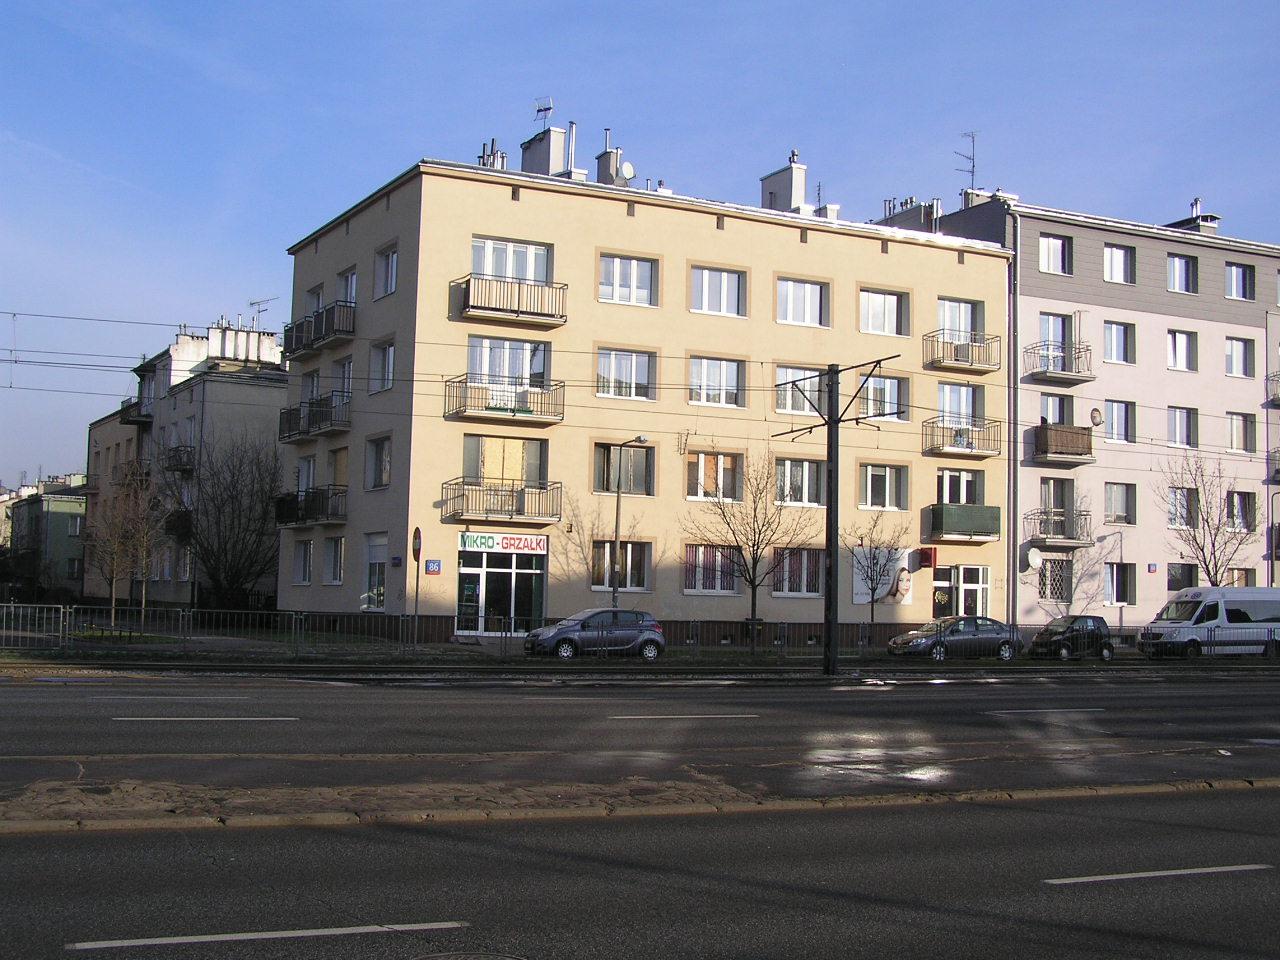 Grochowska 86